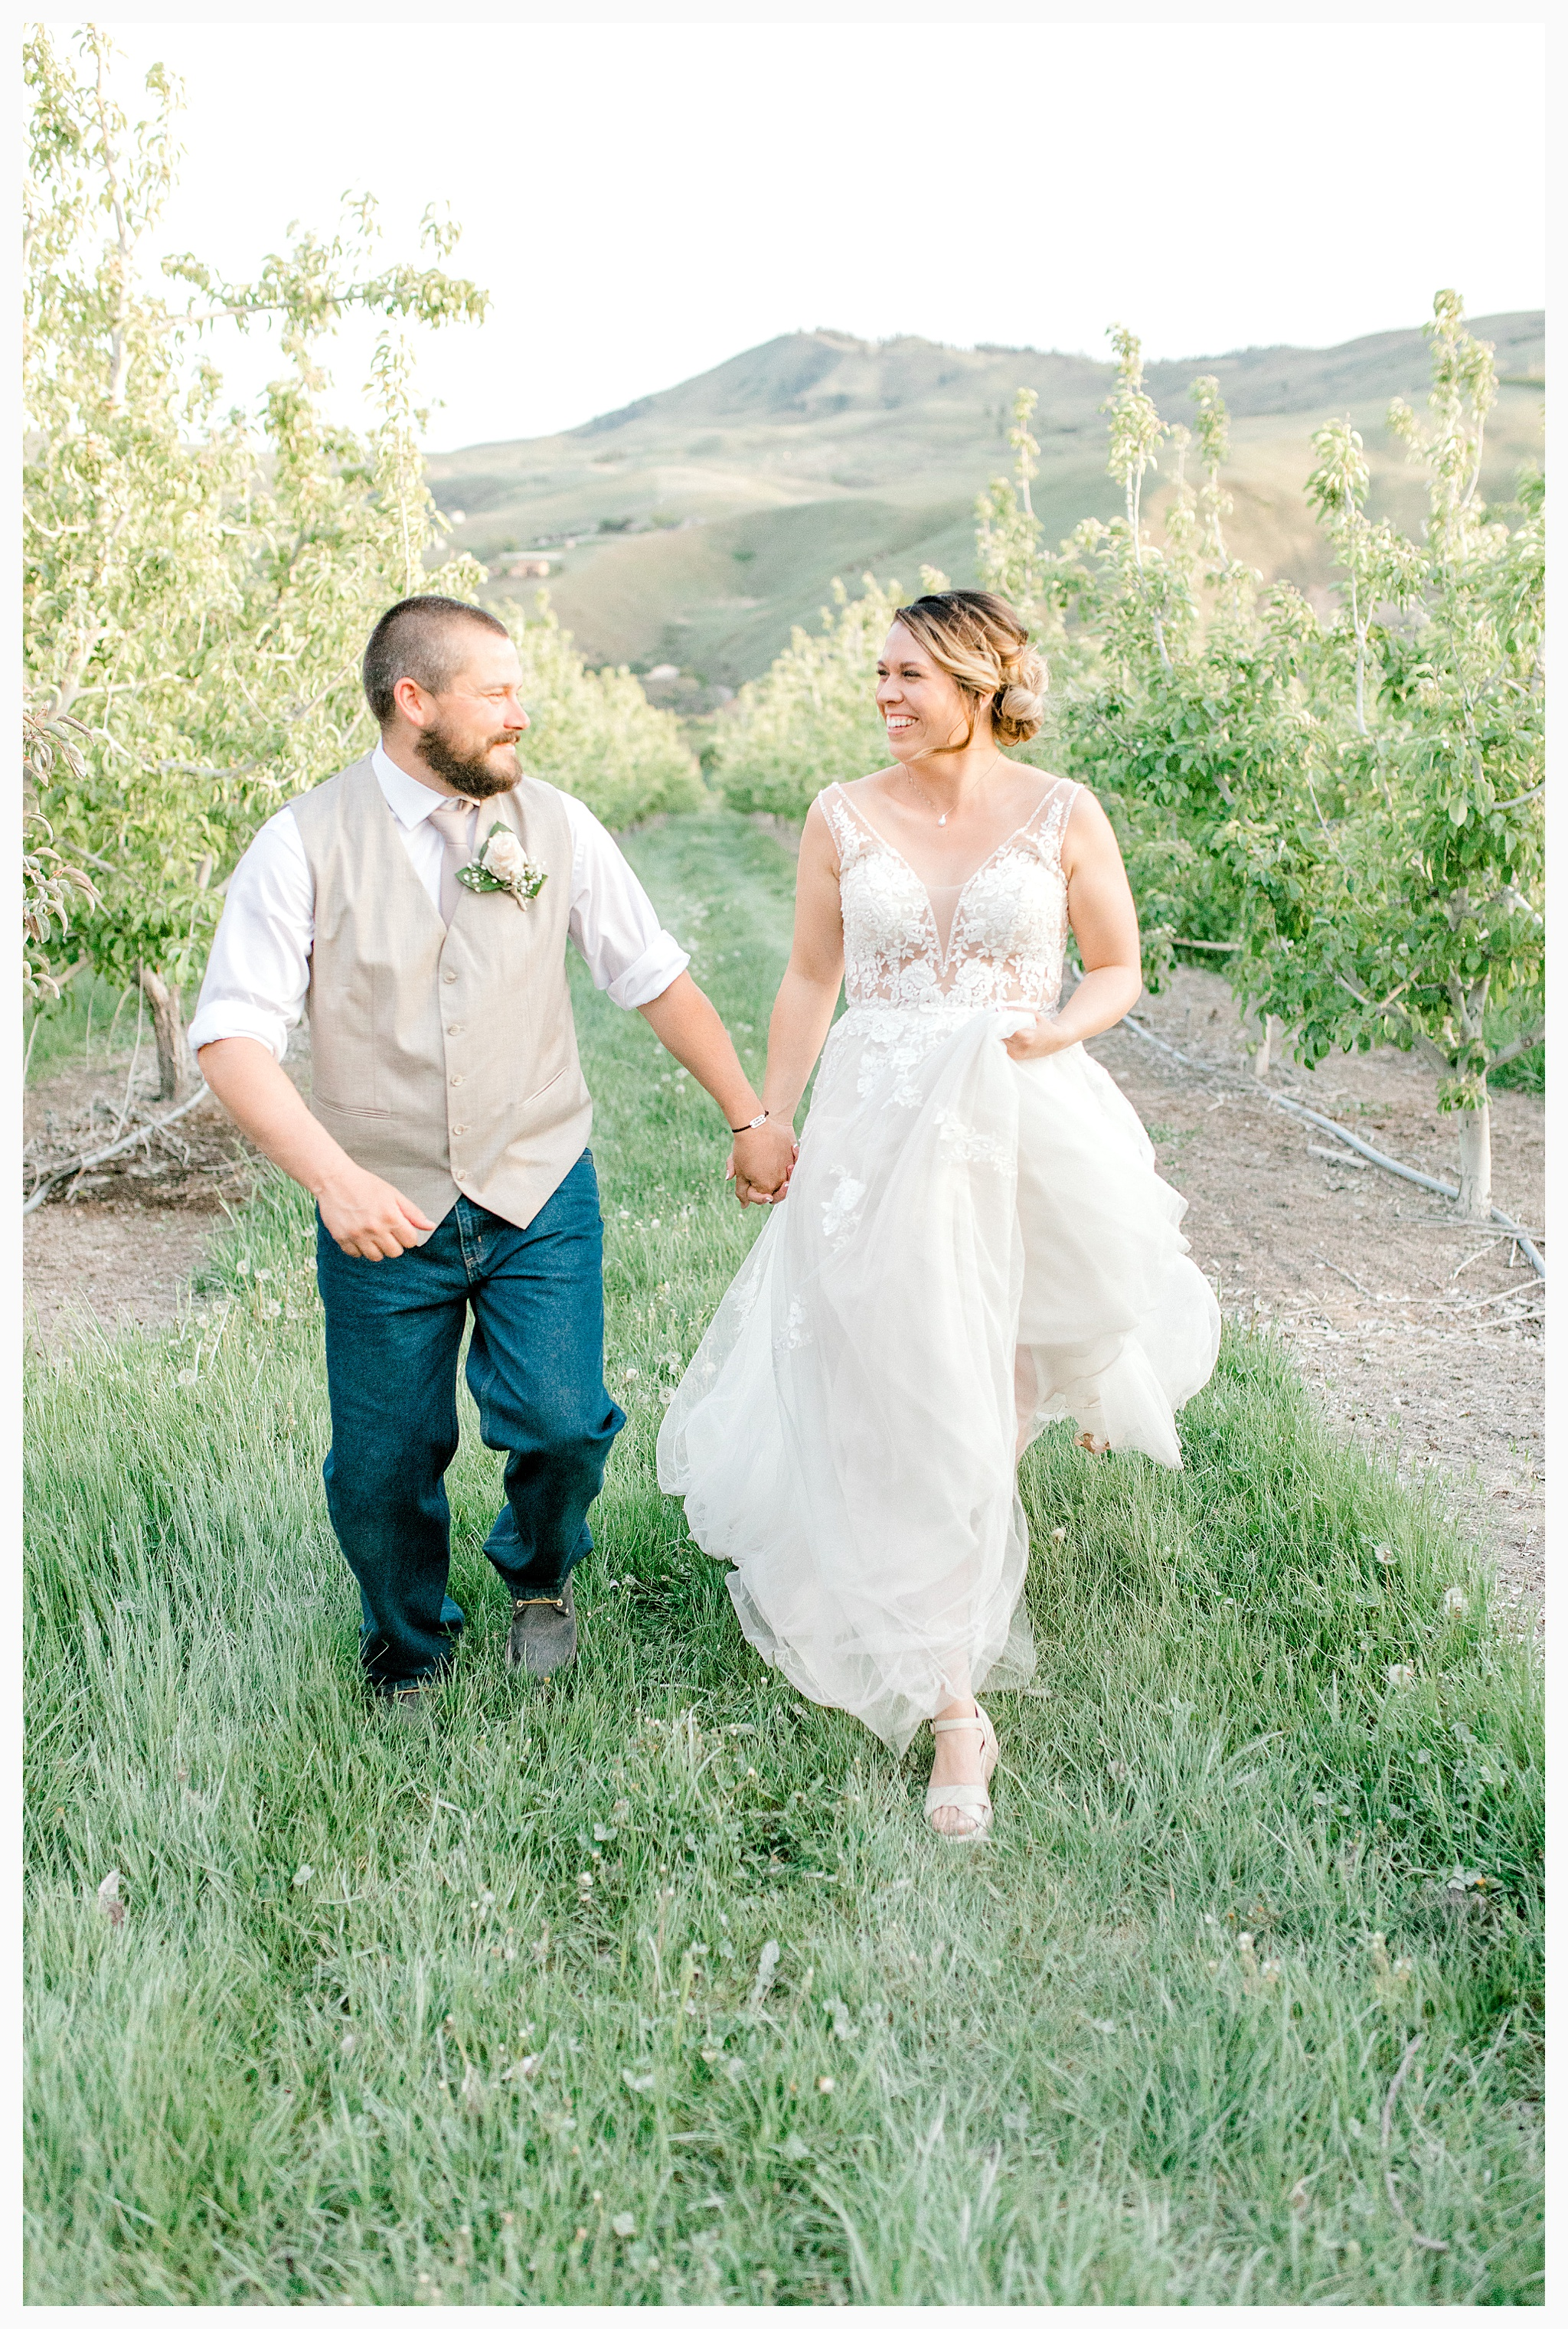 Rustic barn wedding in Wenatchee Washington at Sunshine Ranch on Easy Street, Emma Rose Company Seattle PNW Light and Airy Wedding Photographer_0135.jpg